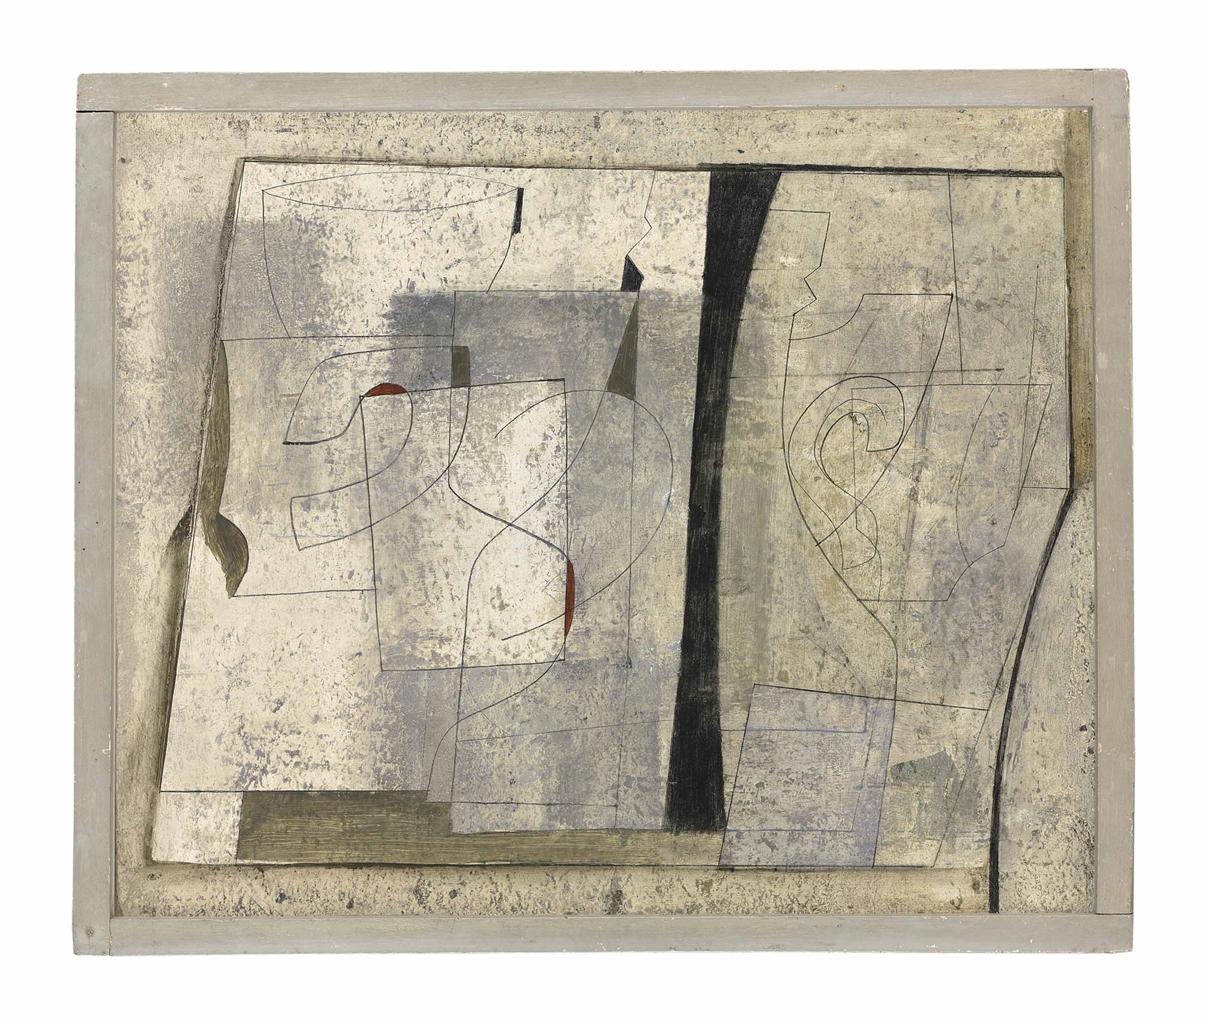 Ben Nicholson-Feb 8-49 still-life (stone)-1949